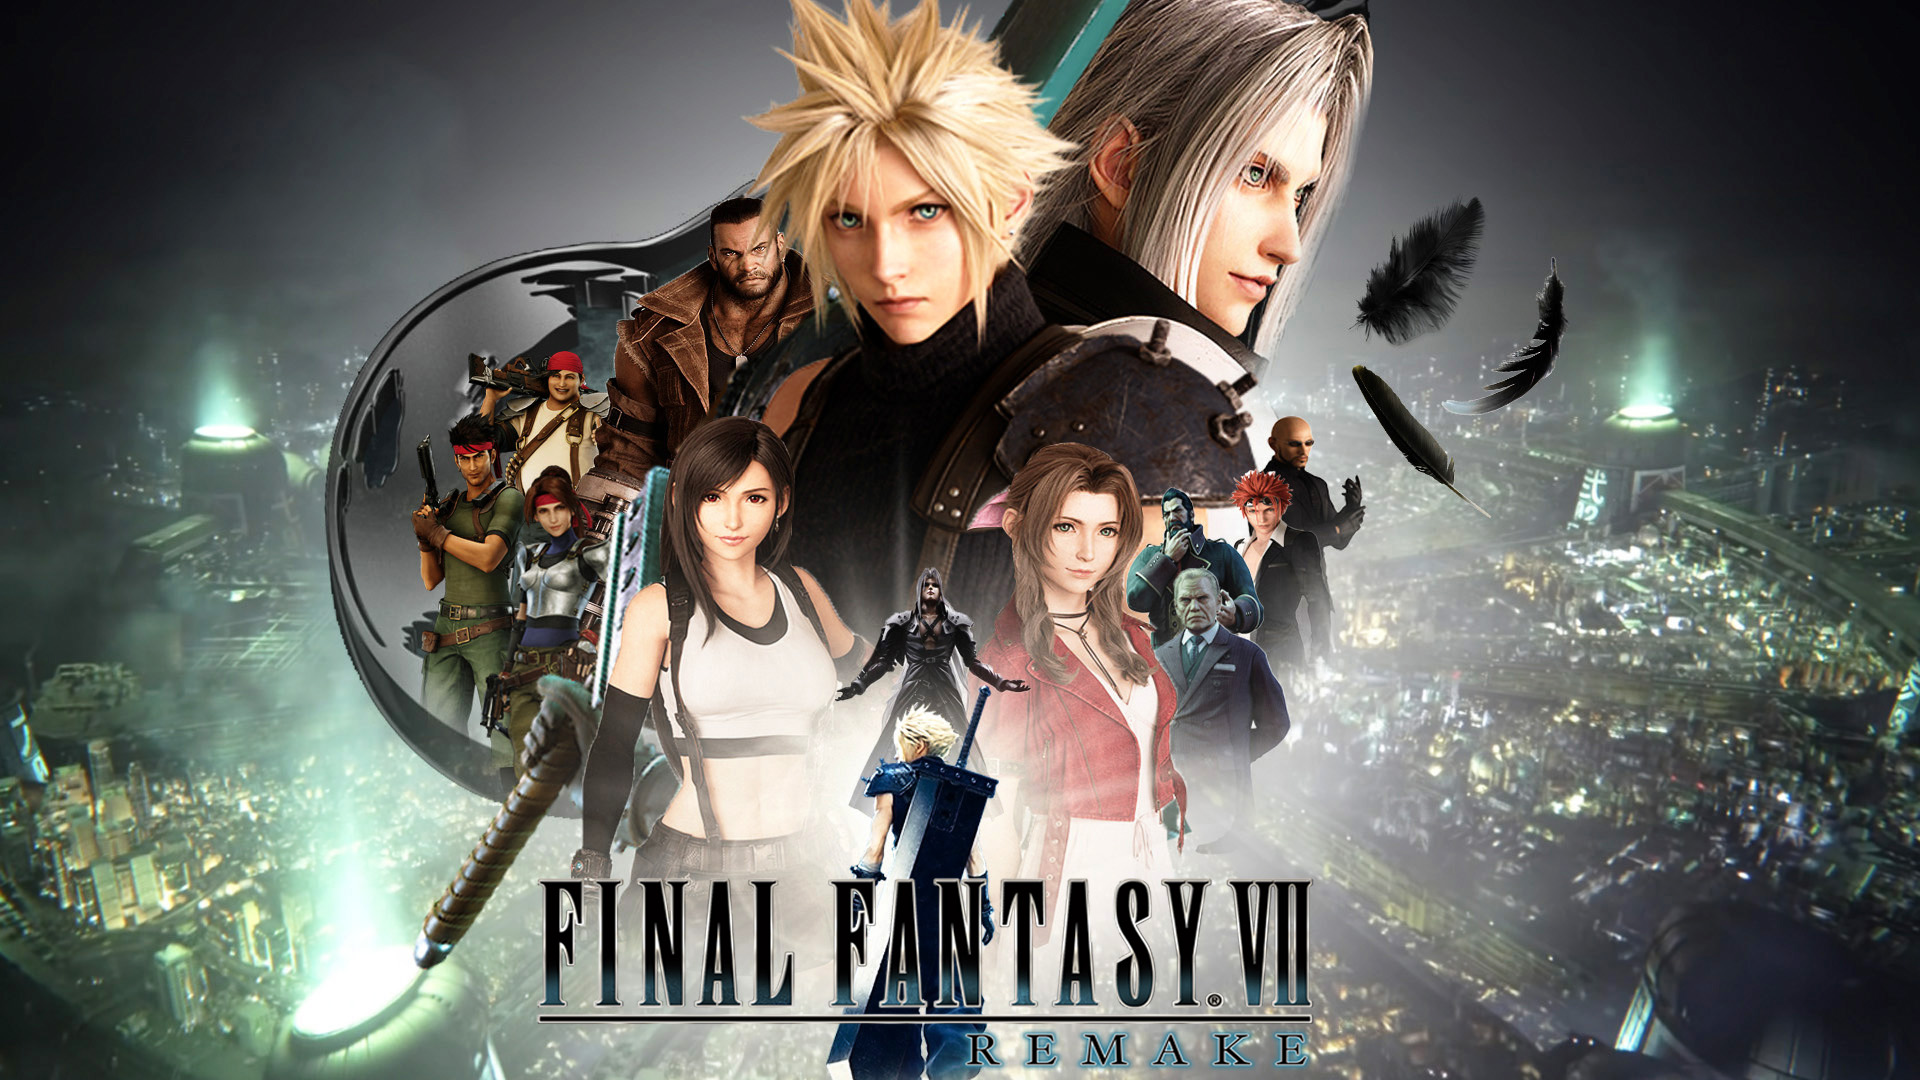 Final Fantasy VII Remake Wallpaper by The-Dark-Mamba-995 ...